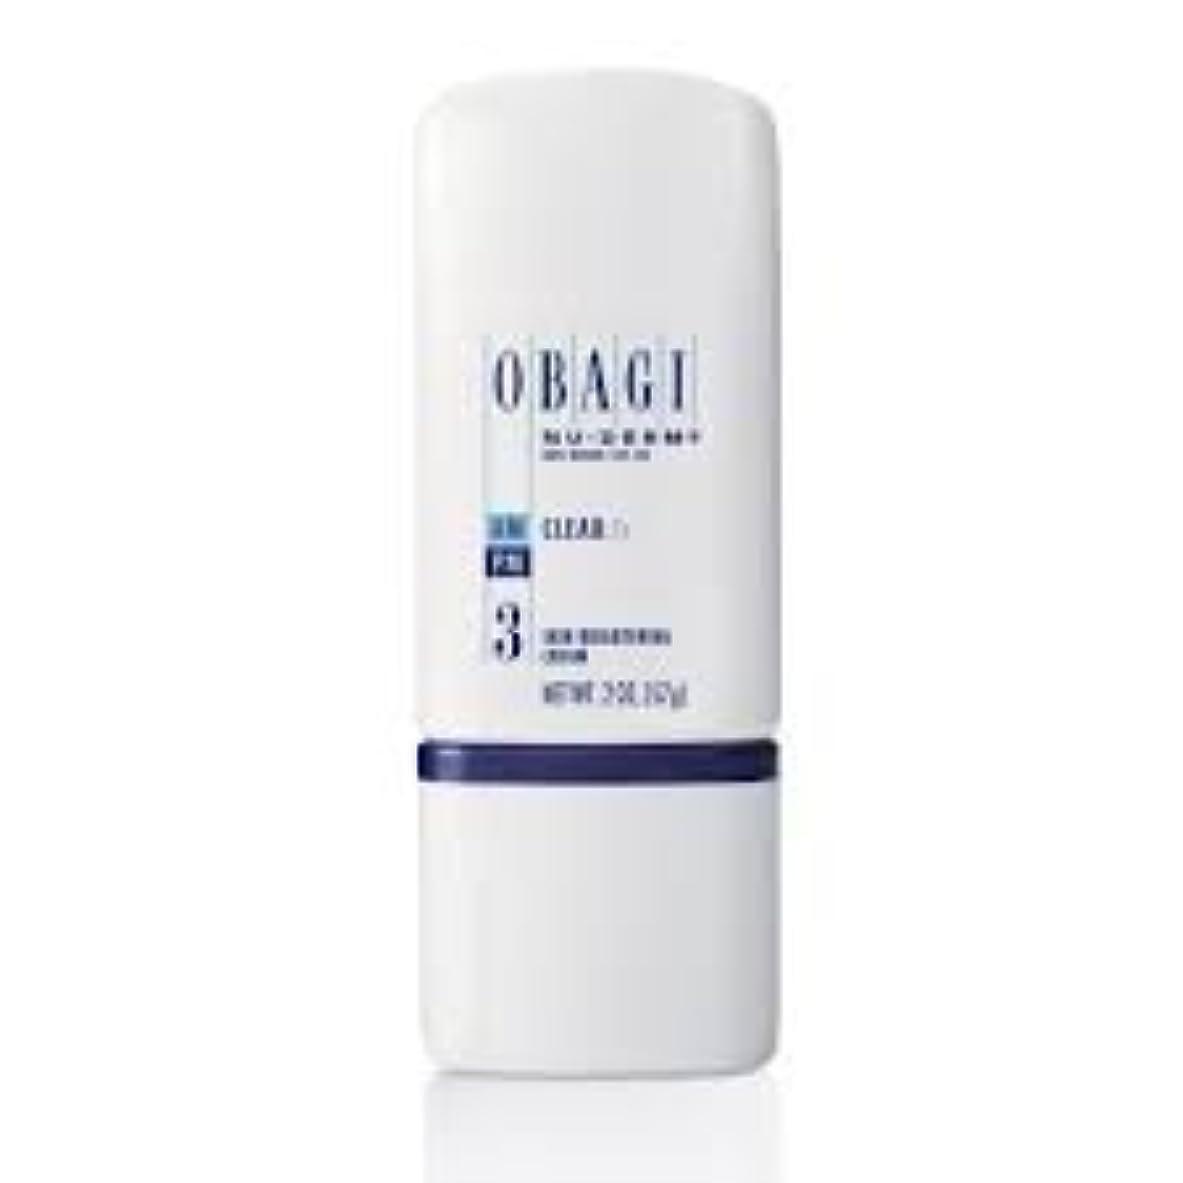 Obagi Nu Derm Clear Fx Skin Brightening Cream 2 oz/57.gオバジクリーム [並行輸入品]